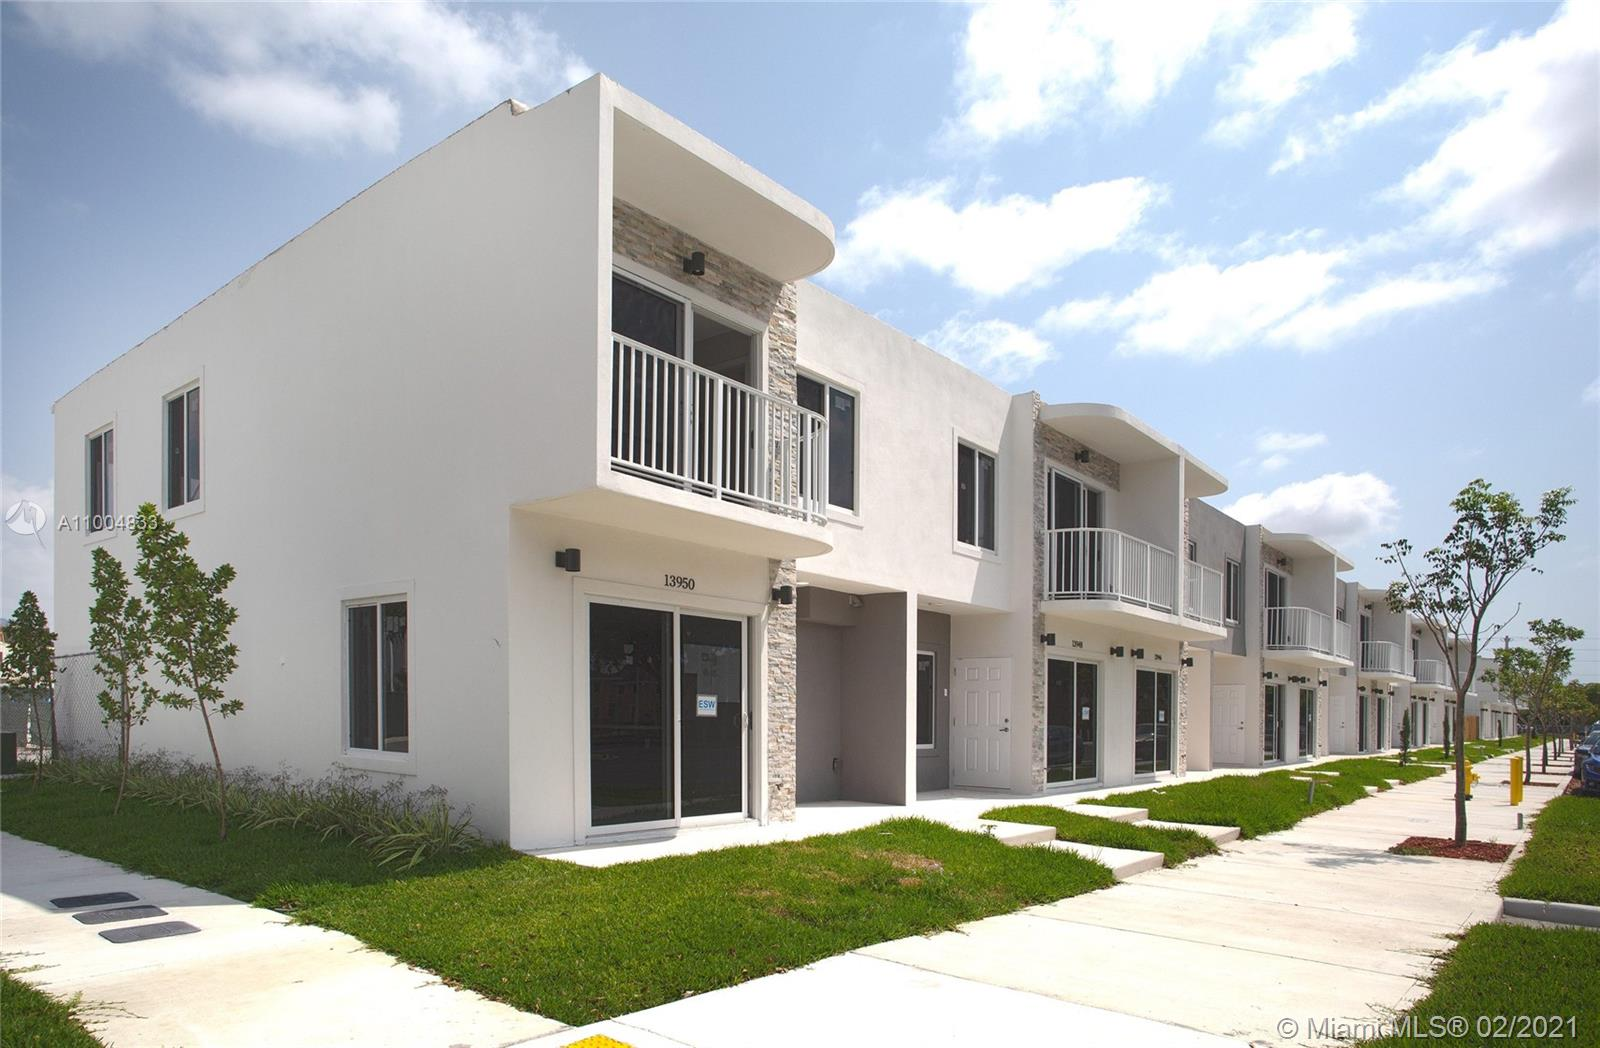 25867 Sw 139 Ct Property Photo